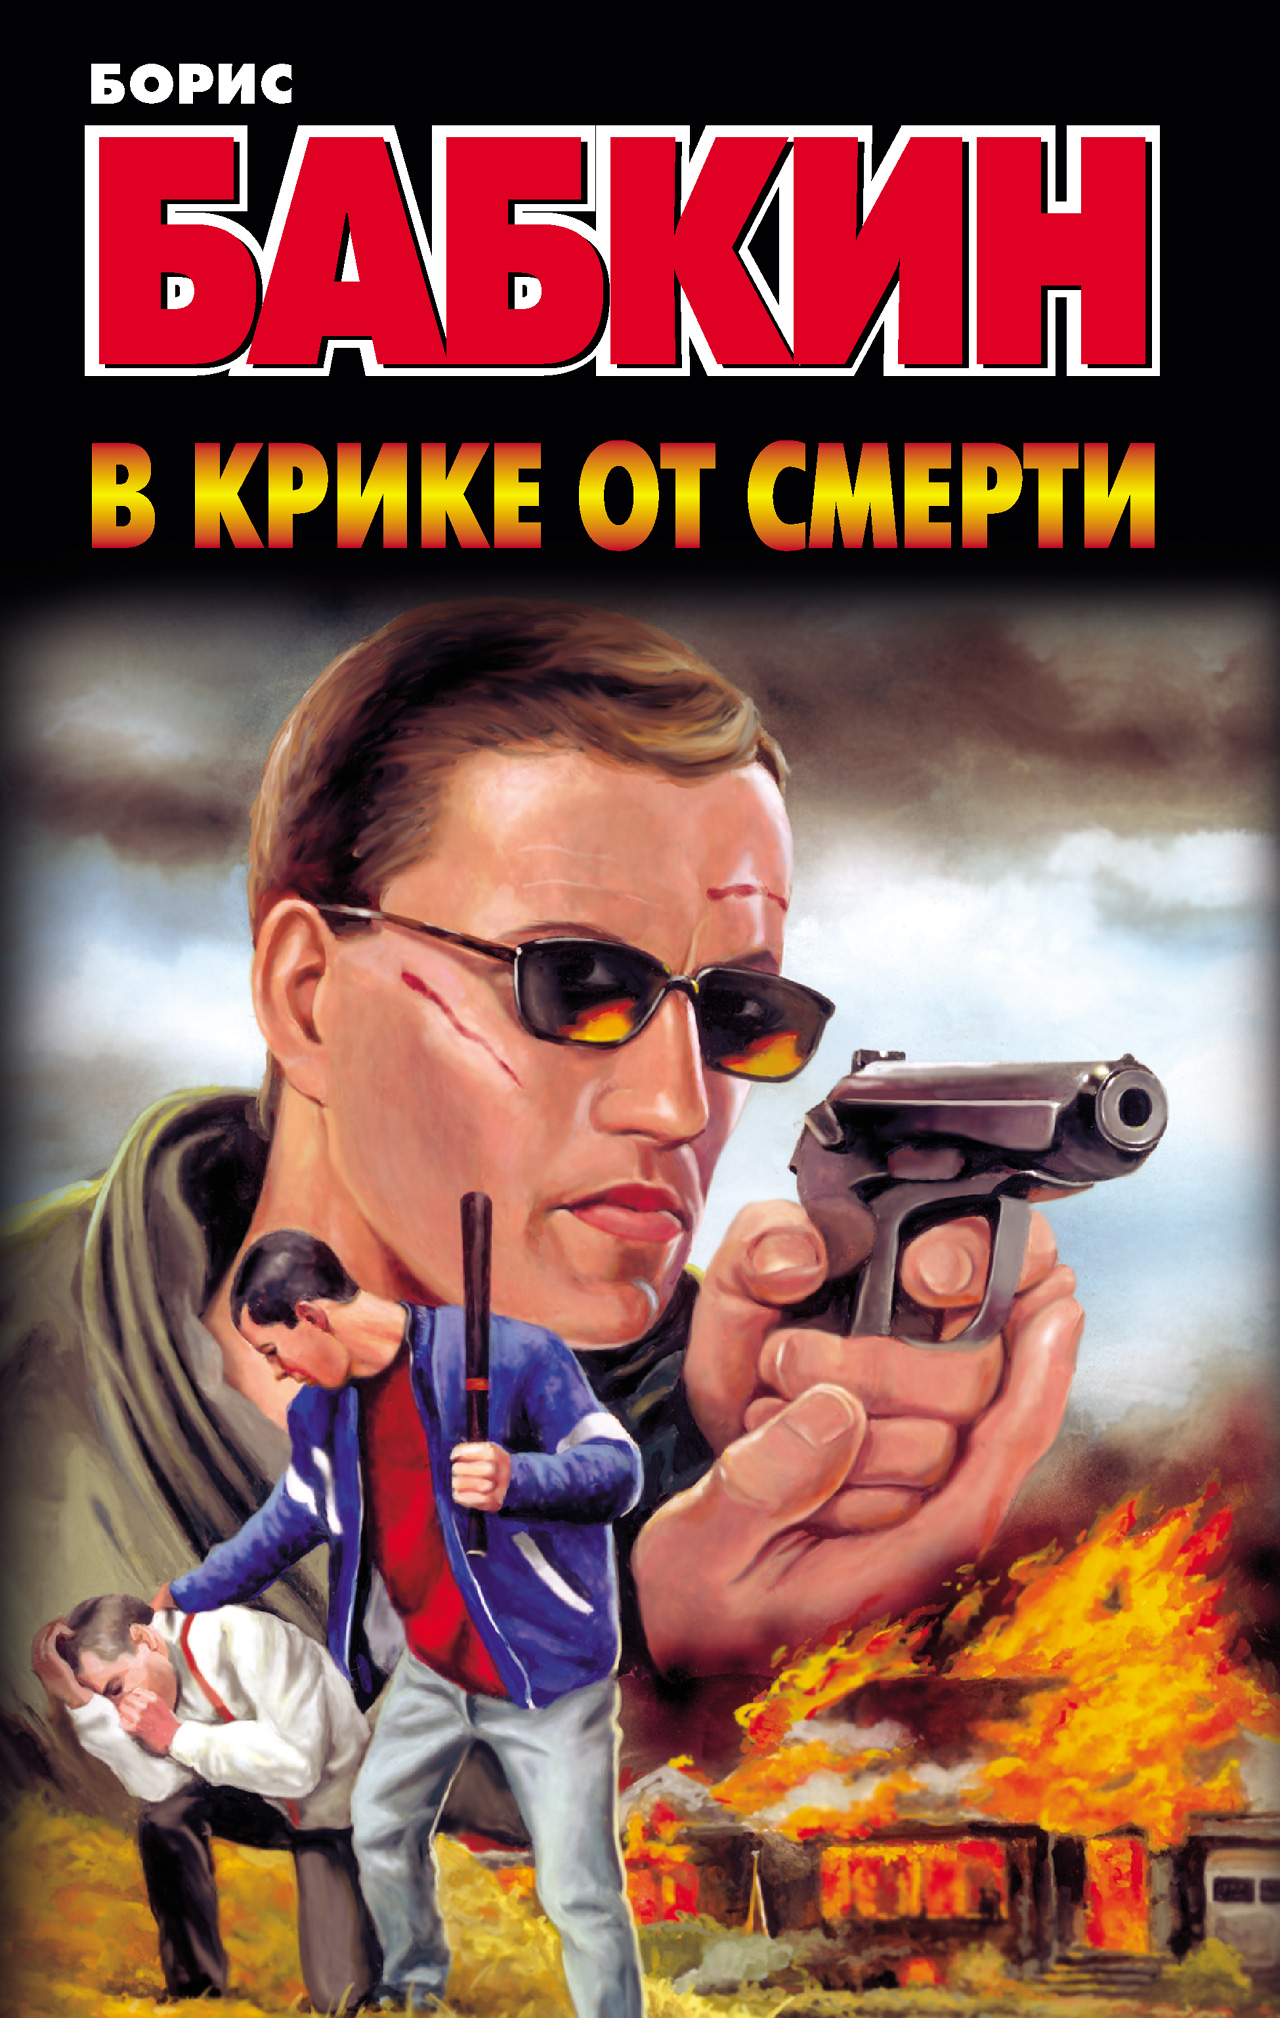 Борис Бабкин В крике от смерти